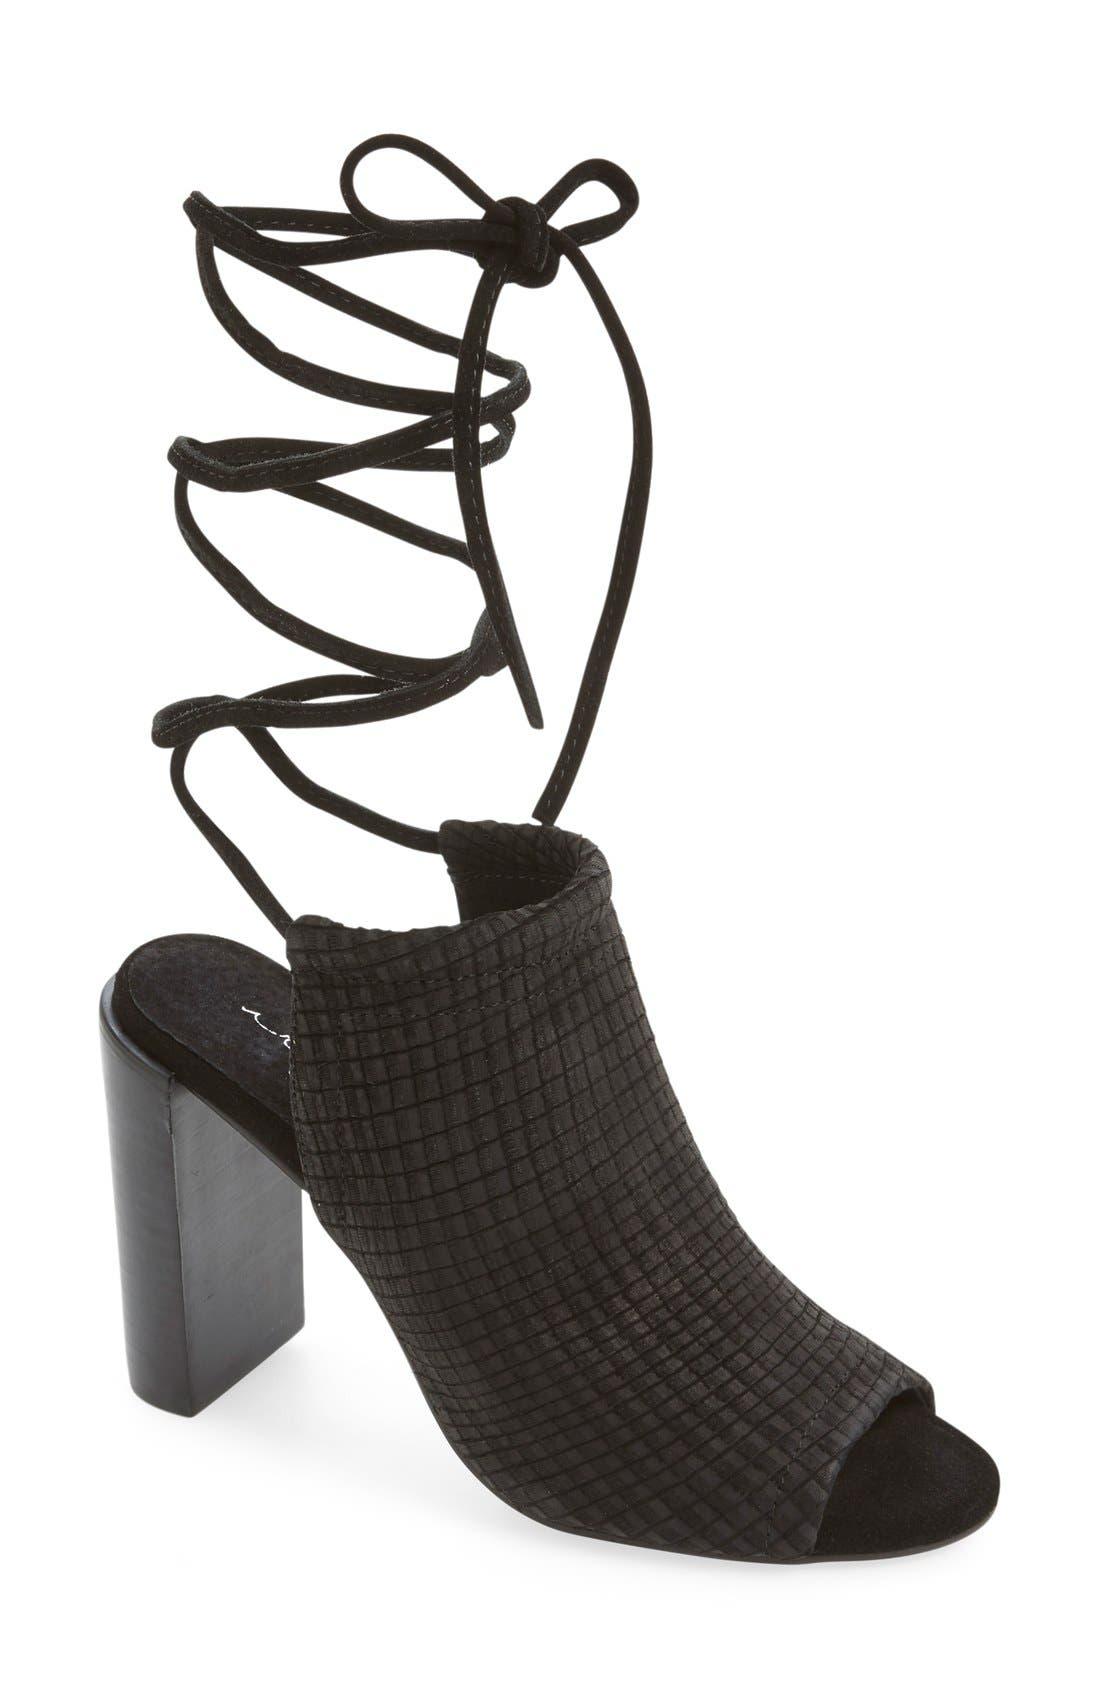 Main Image - Urge Footwear 'Eve' Lace-Up Mule Sandal (Women)